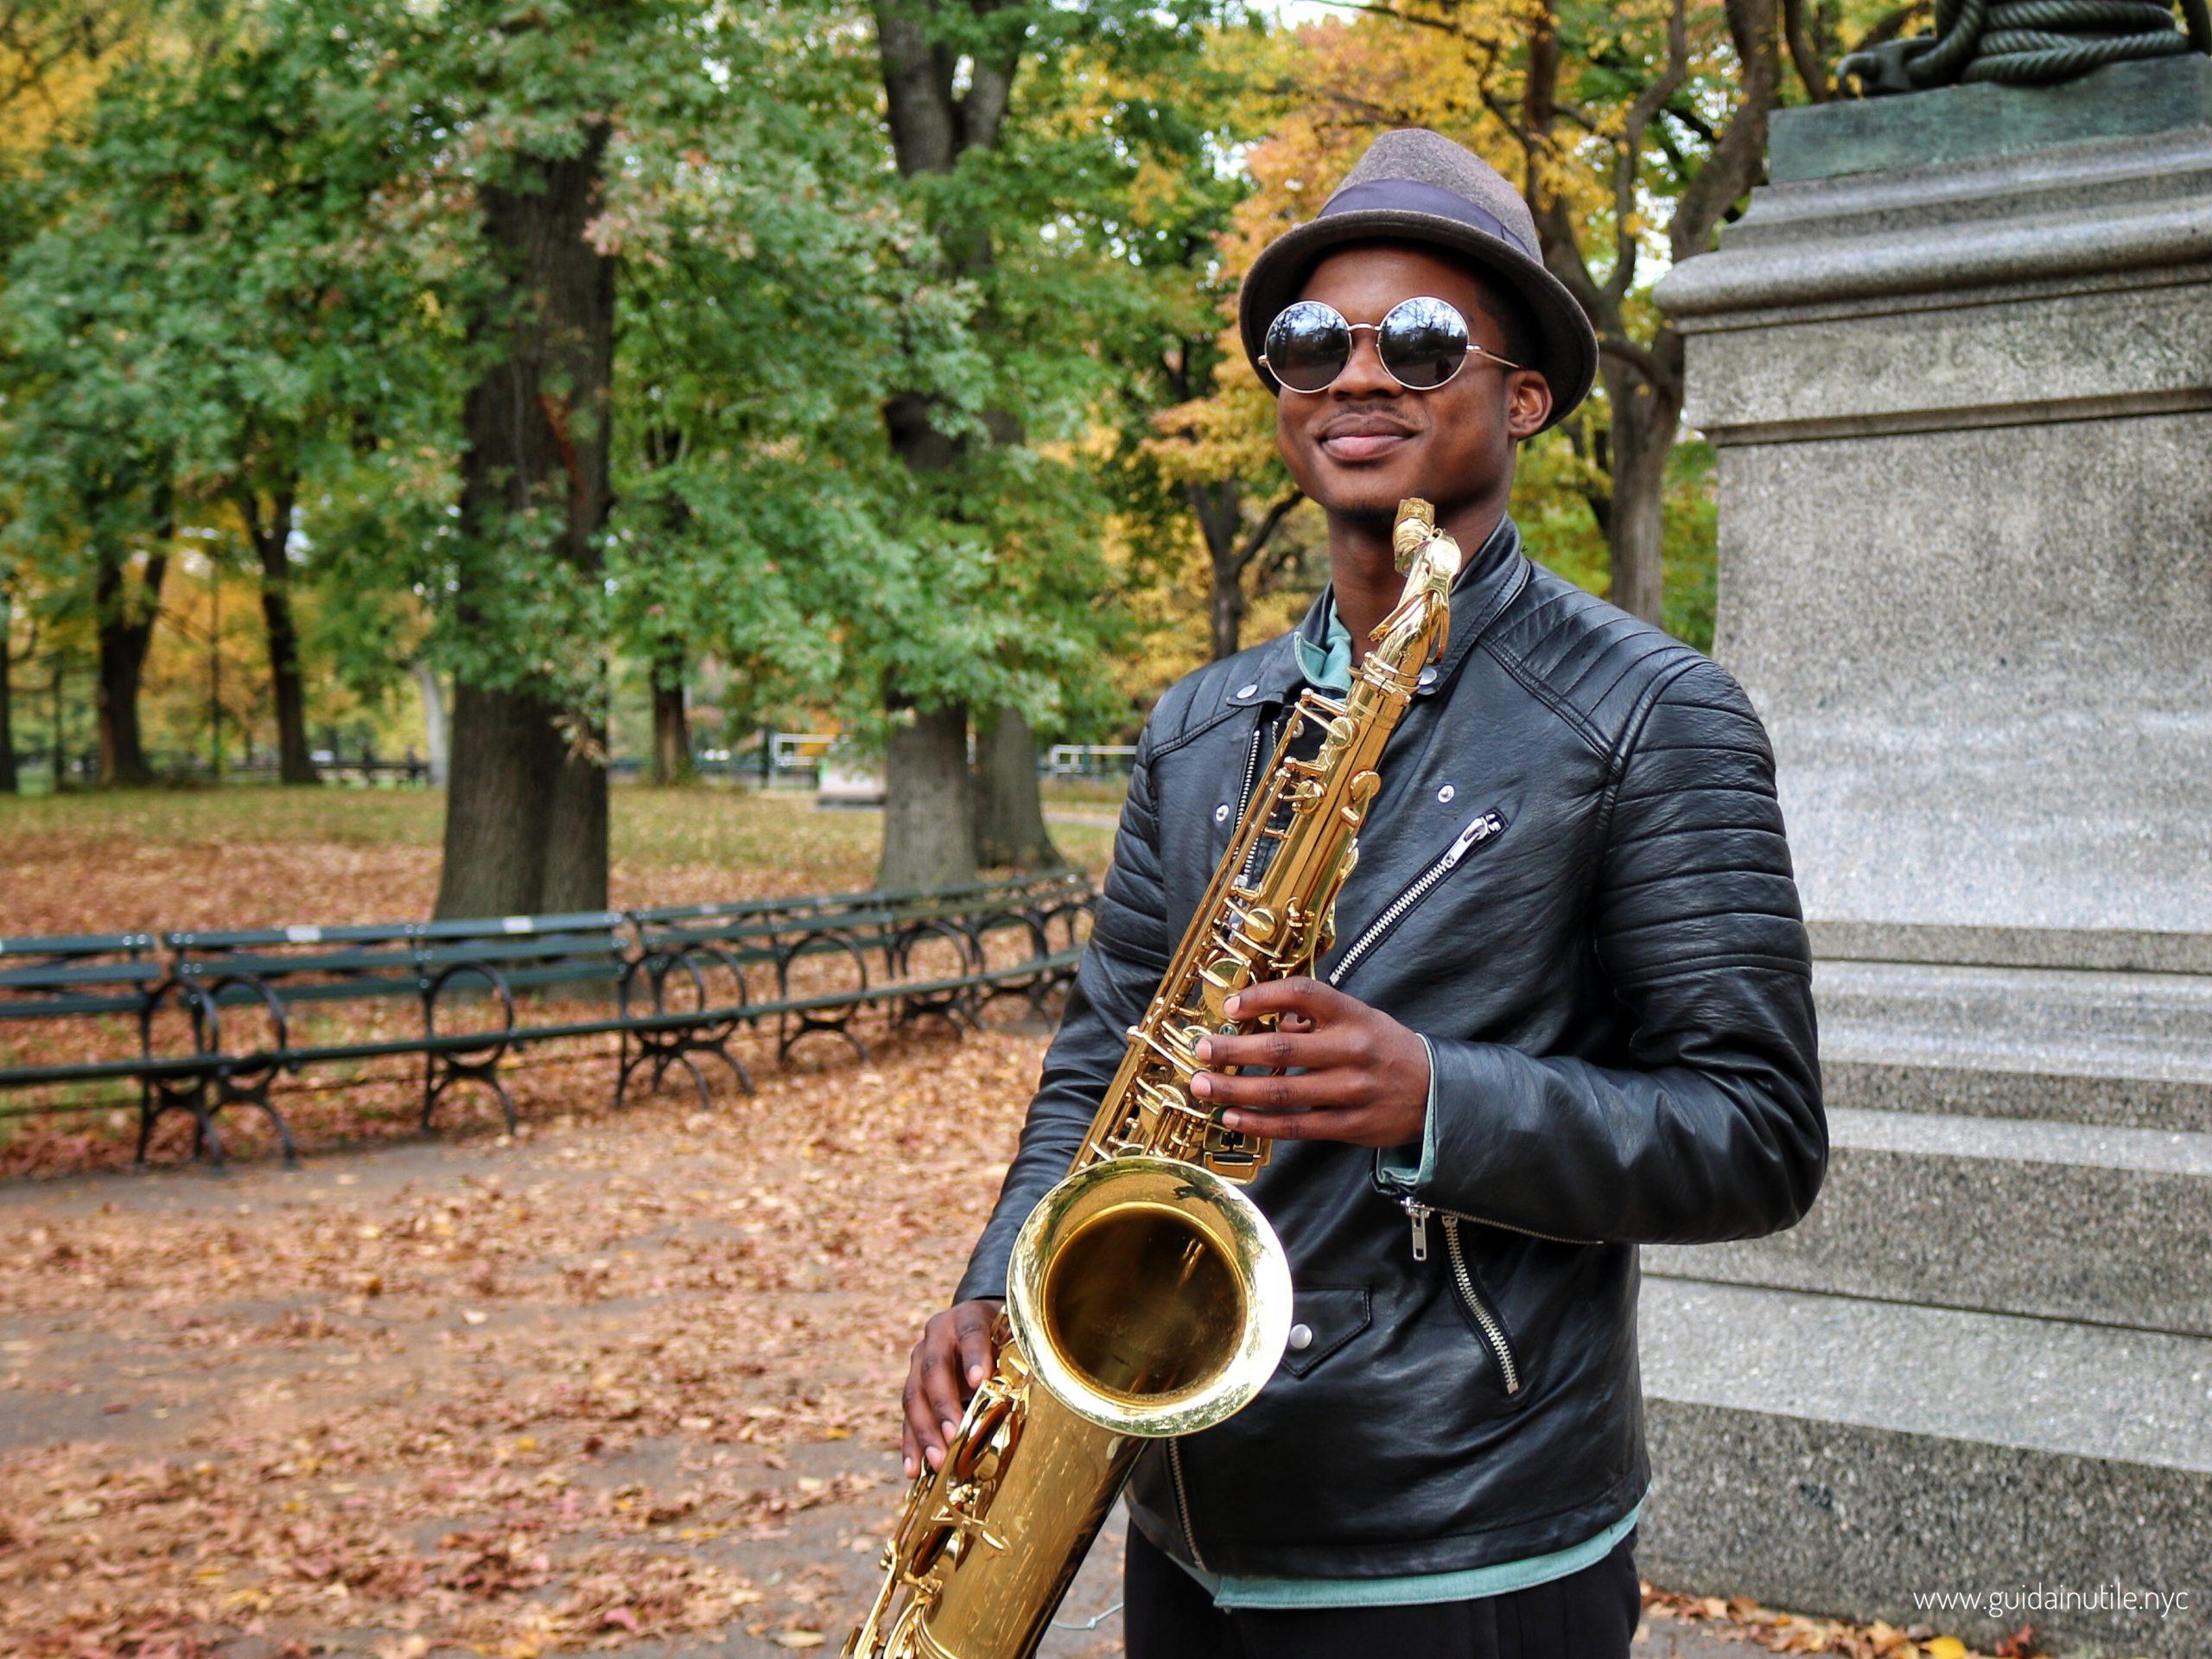 Utril Rhaburn, Young Nomadic, Central Park, New York City